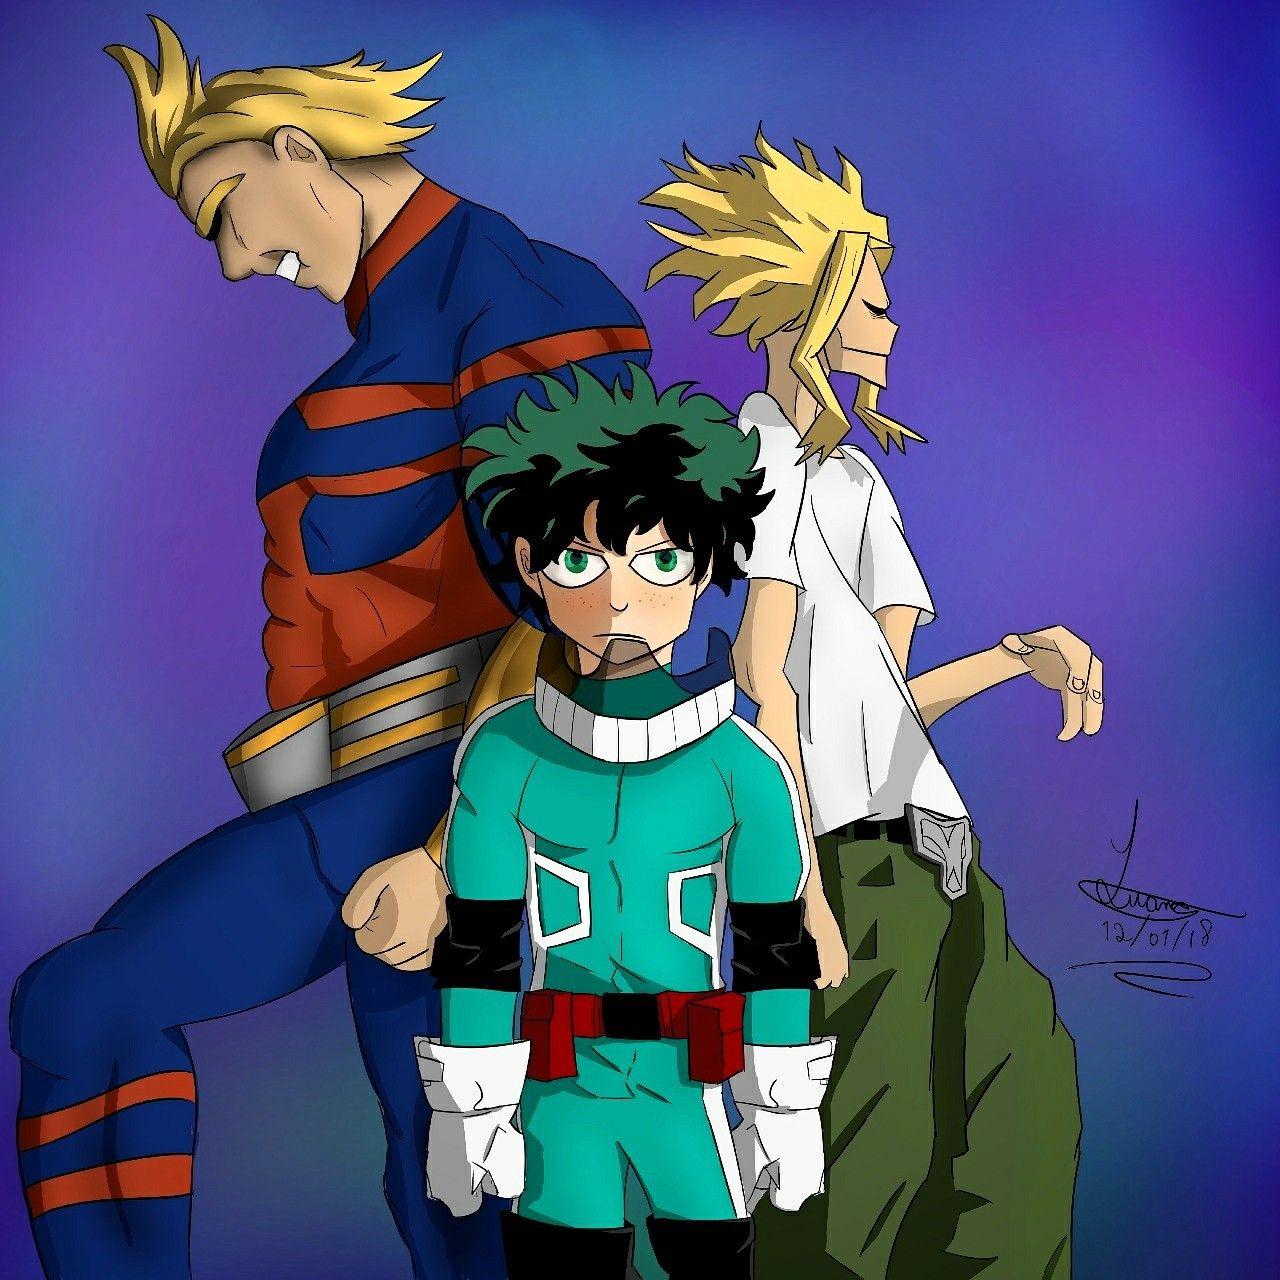 The Day Has Come Boku No Hero Academia Boku No Hero Academia Character Hero